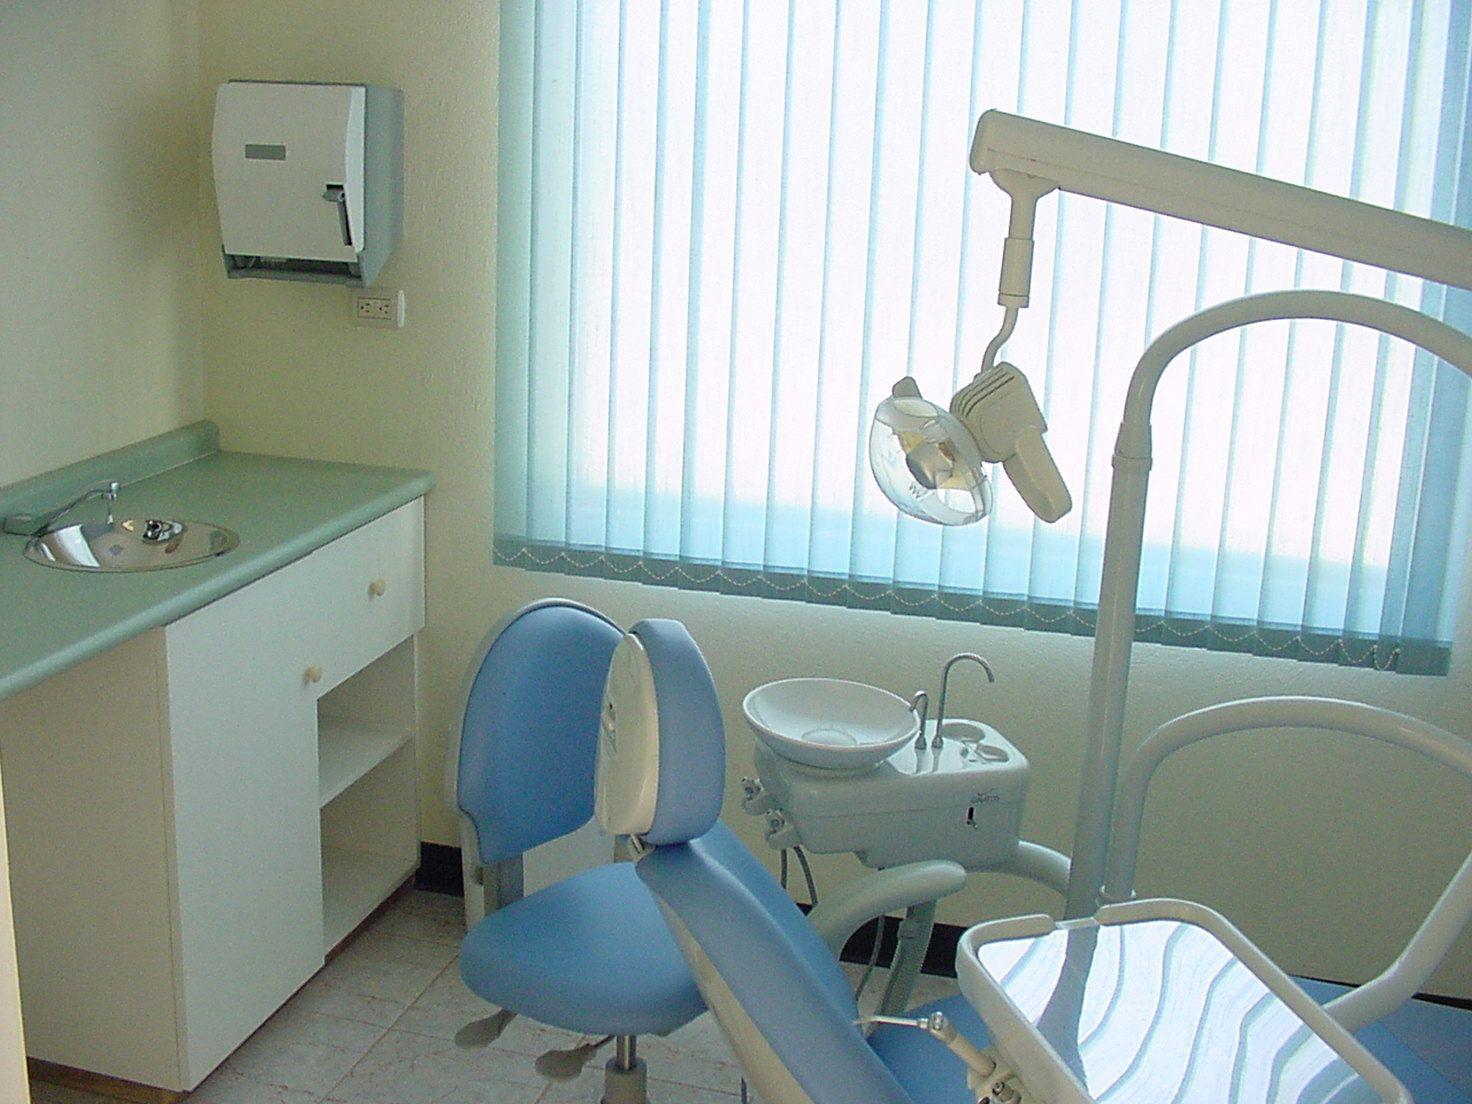 Aesthetic Dental Implantology